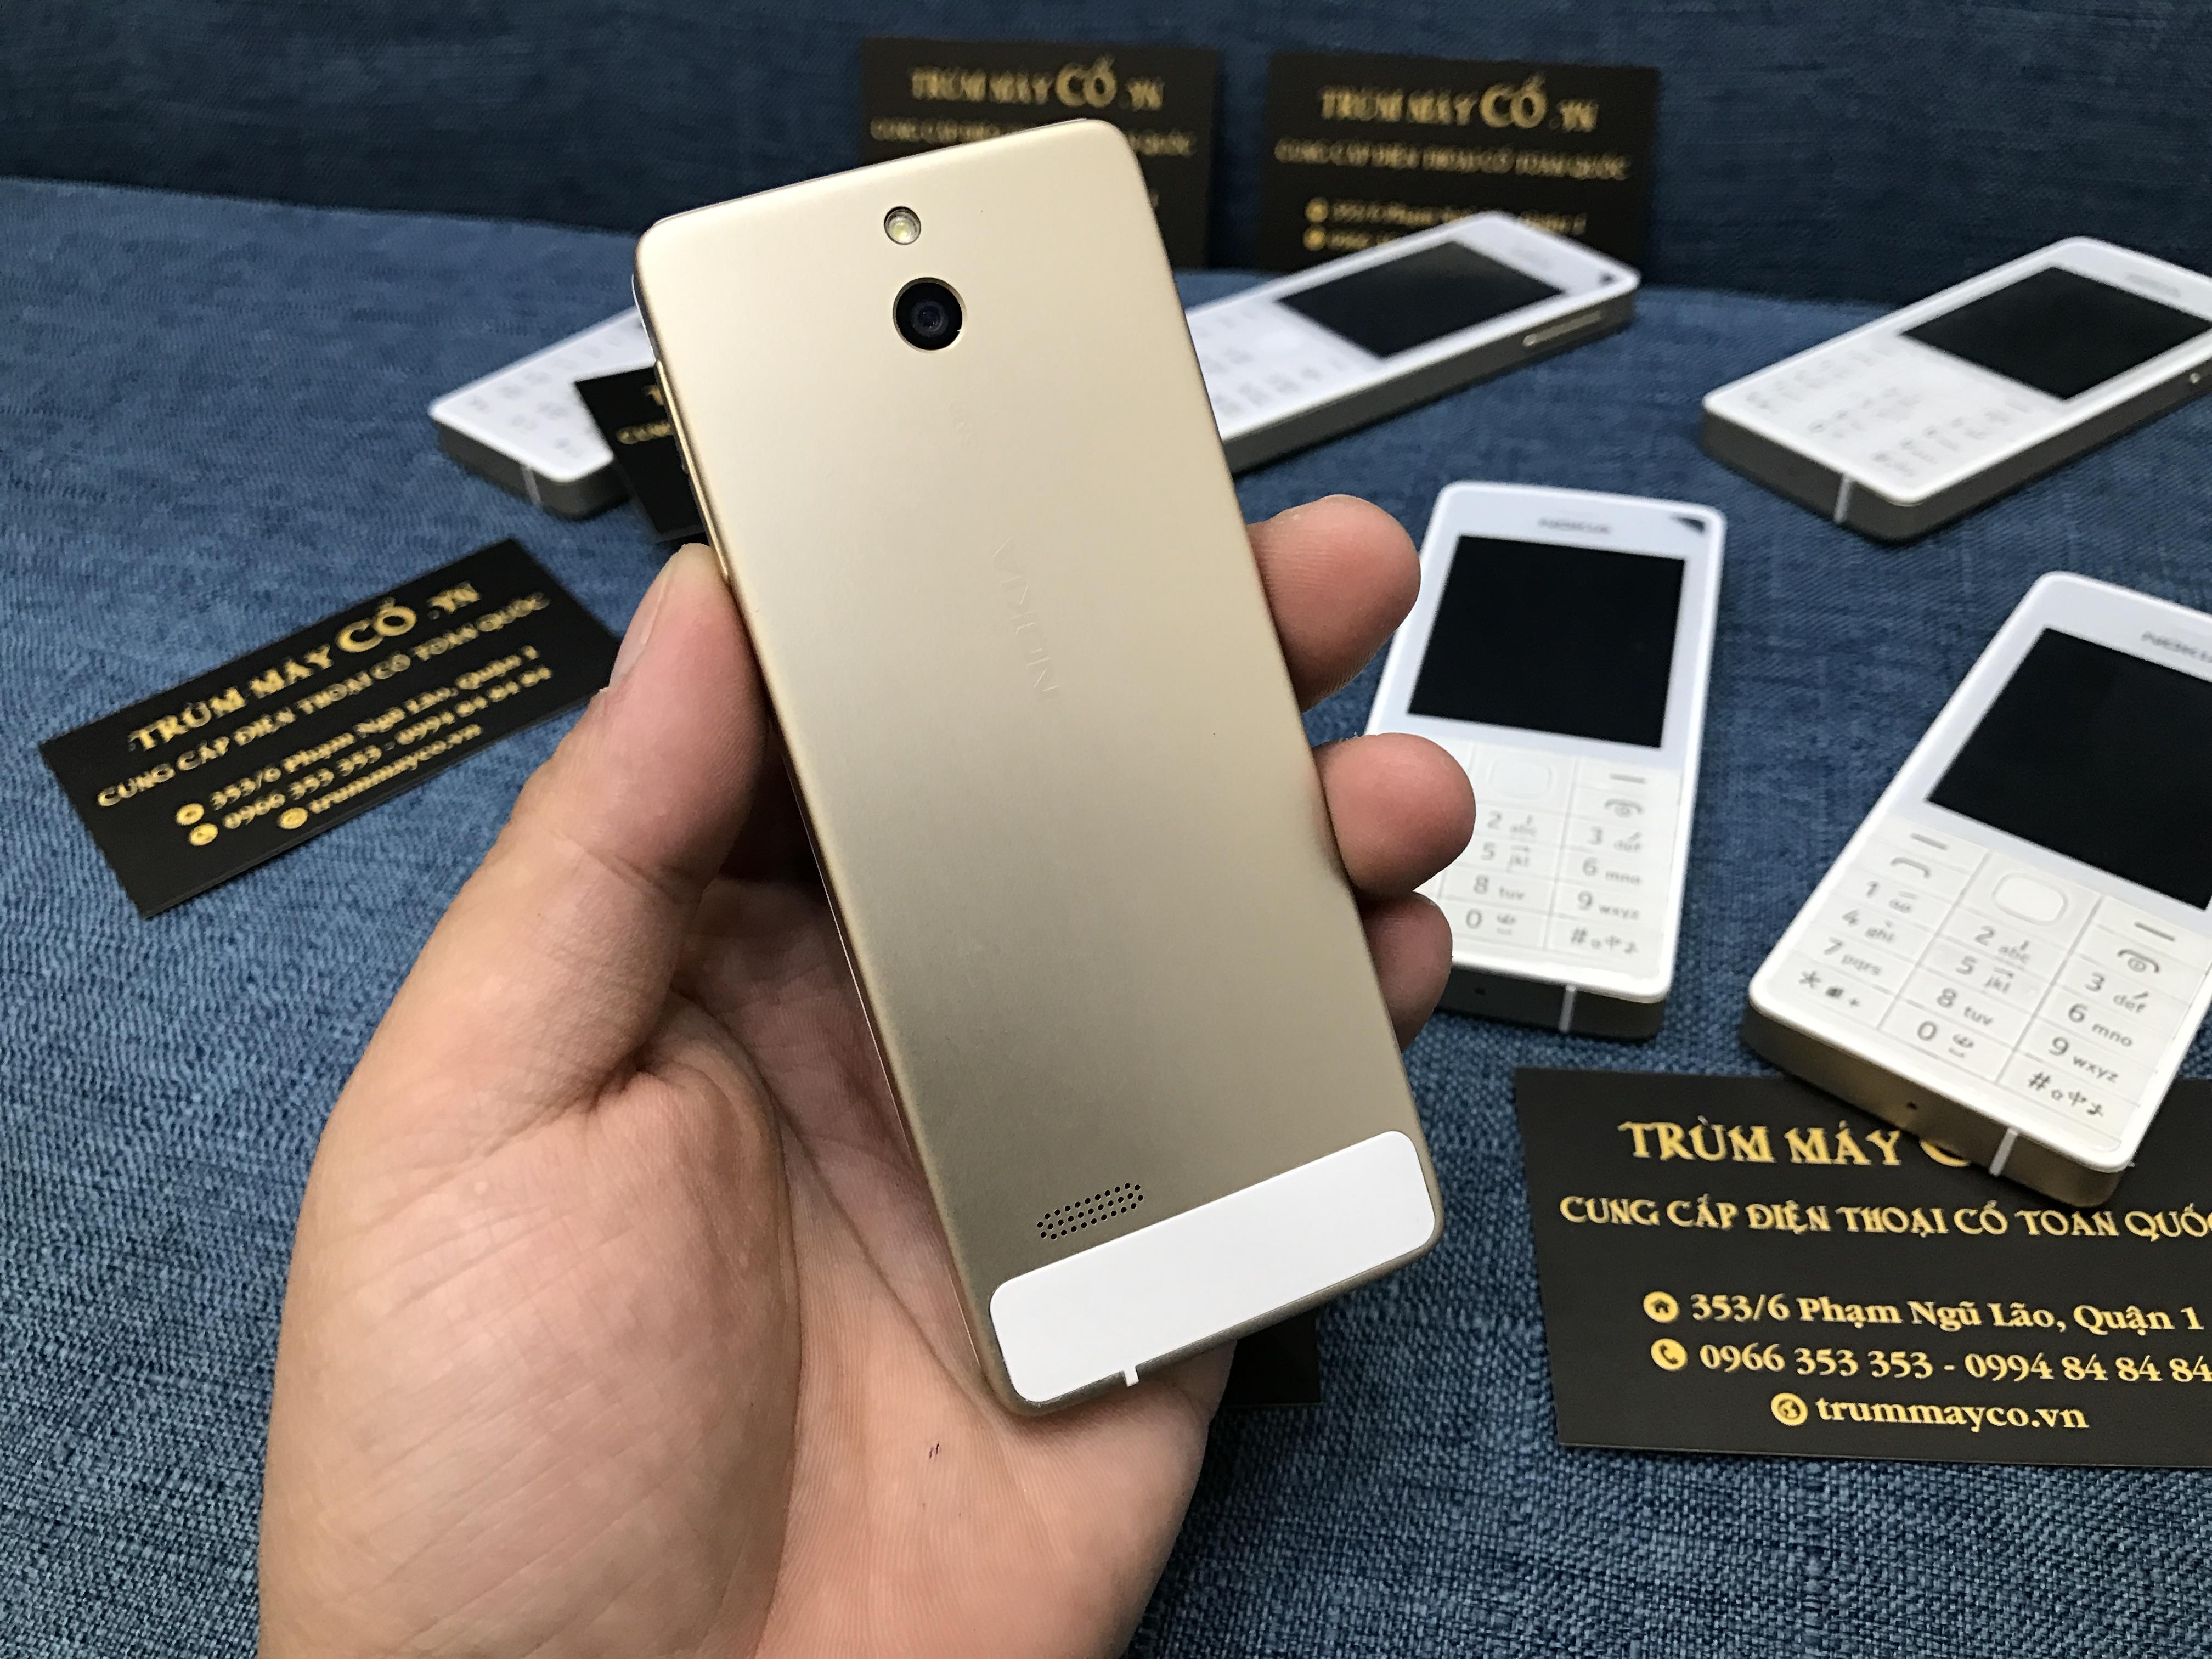 điện thoại nokia 515 gold 2 sim